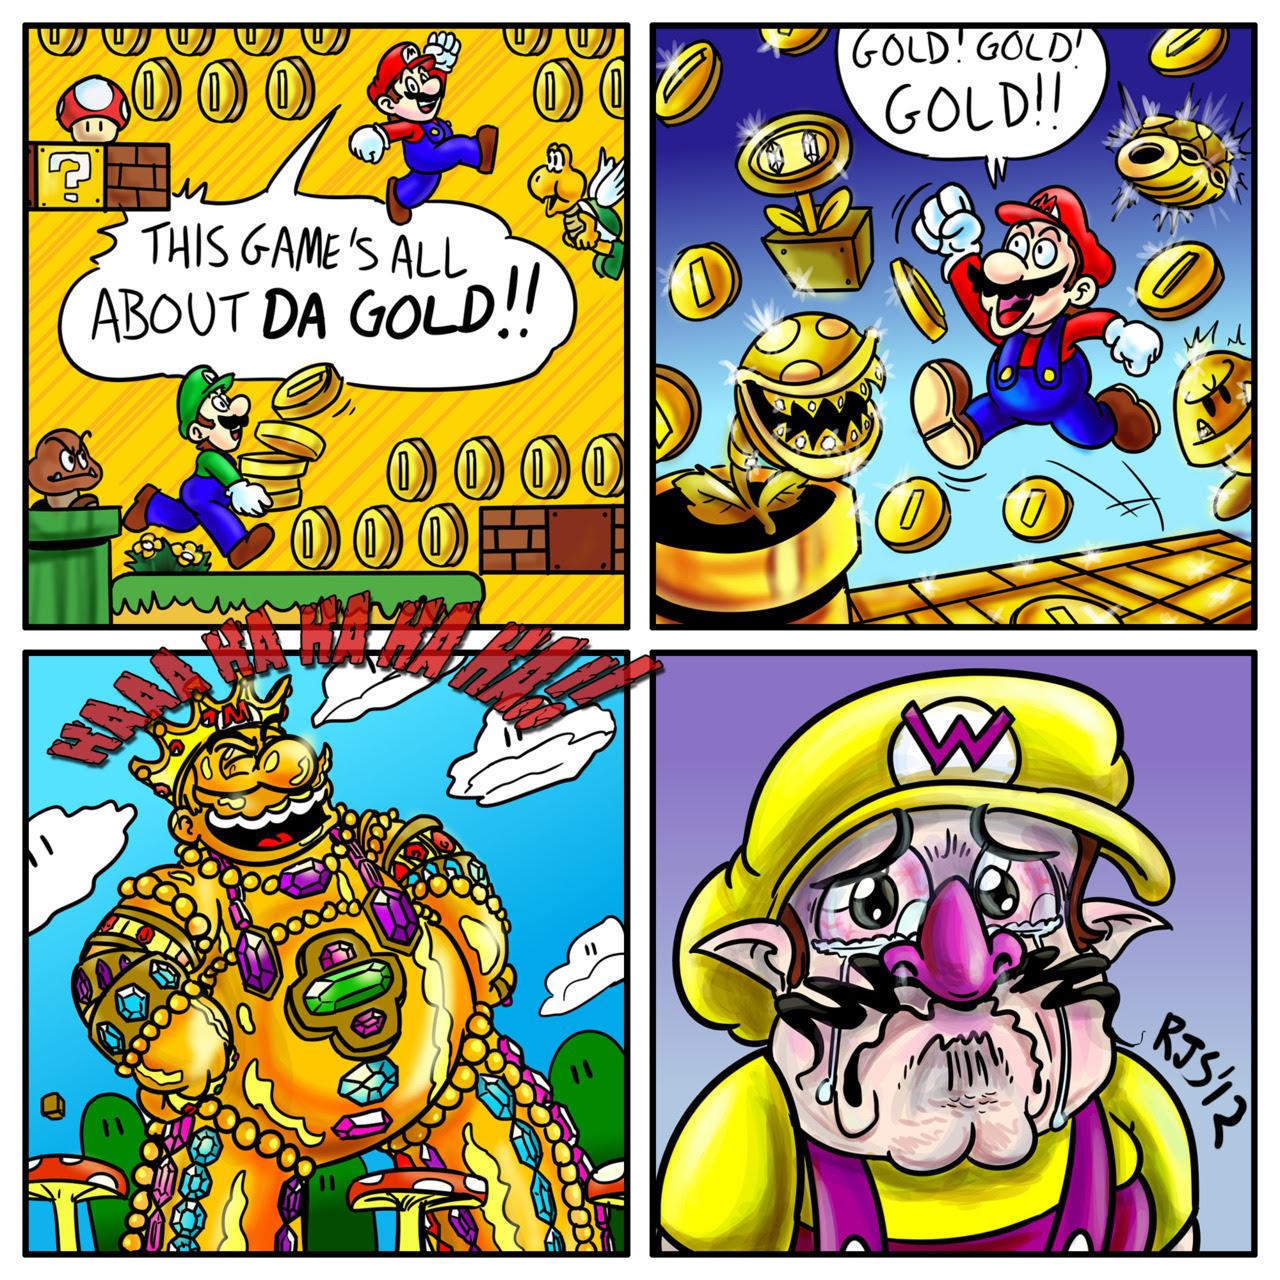 New Super Mario Bros 2 Super Mario Bros Fa Art 33319384 Fanpop